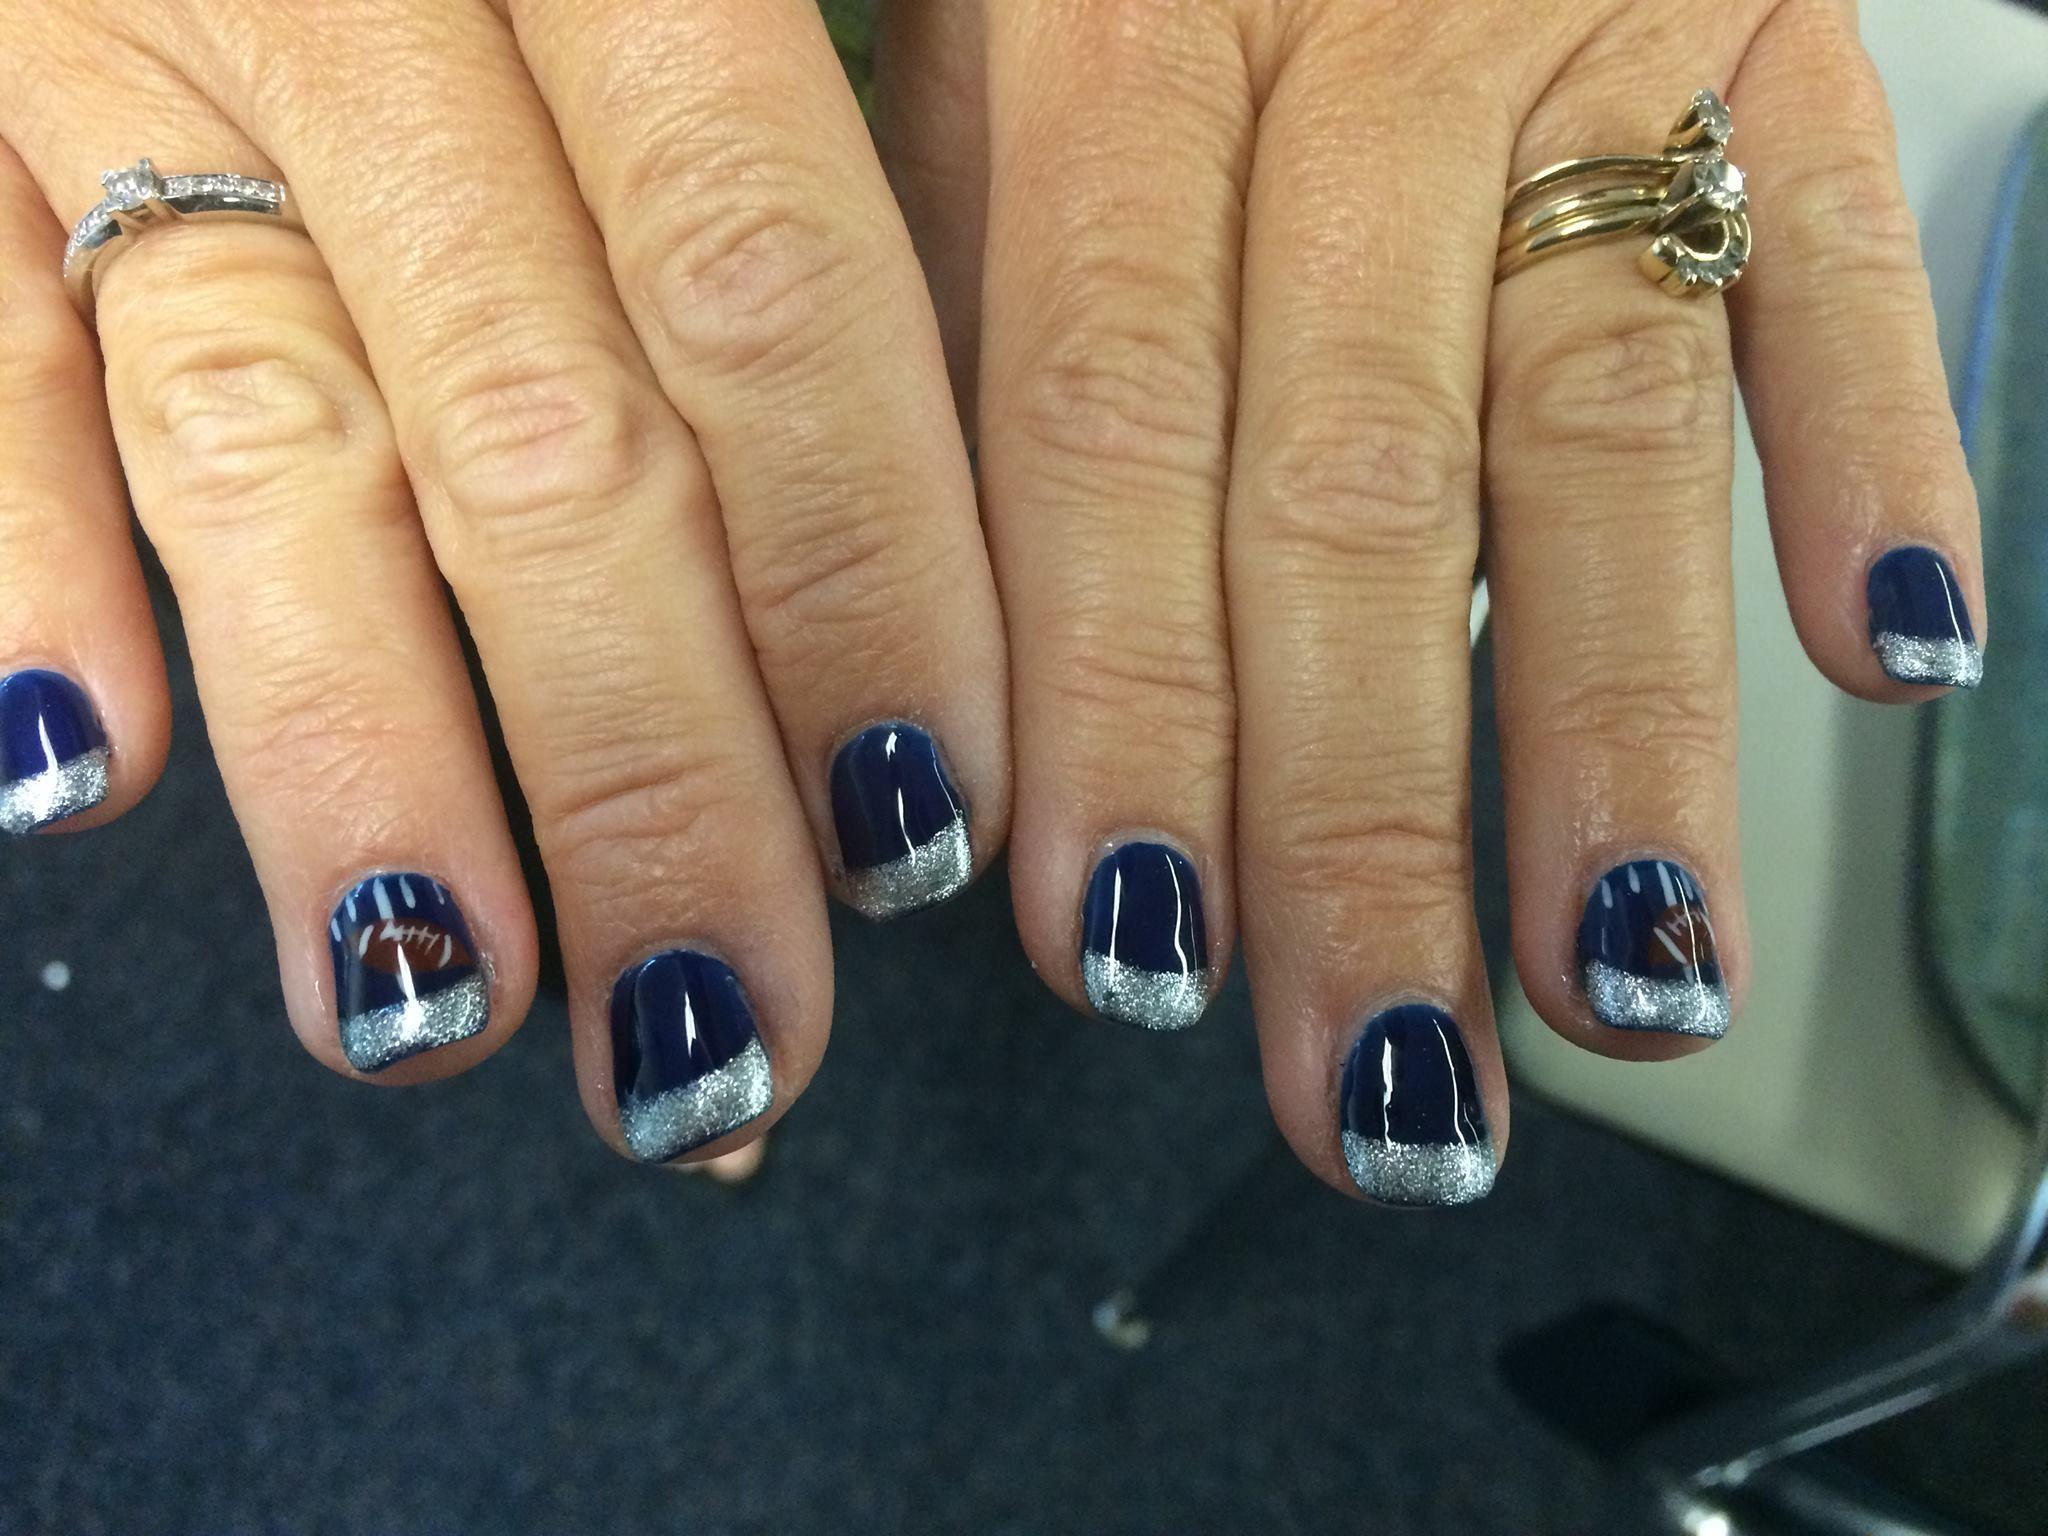 my spirit nails | Spirit nails, Nails, Nail art